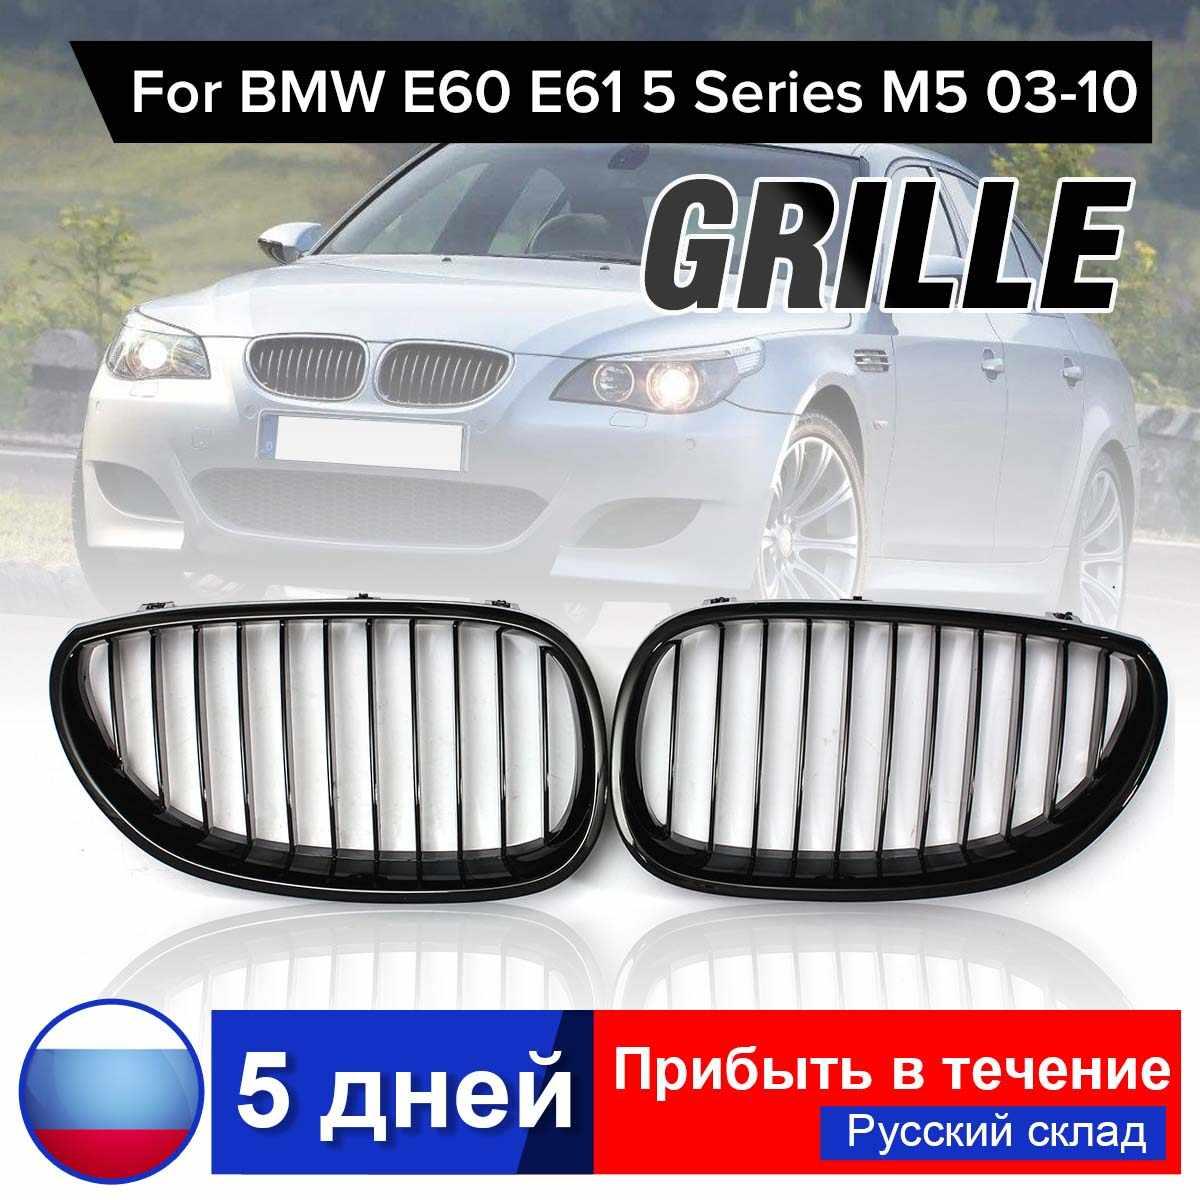 2Pcs Gloss Hitam Depan Sport Lebar Ginjal Grille Grill untuk BMW E60 E61 5 Series M5 2003-2010